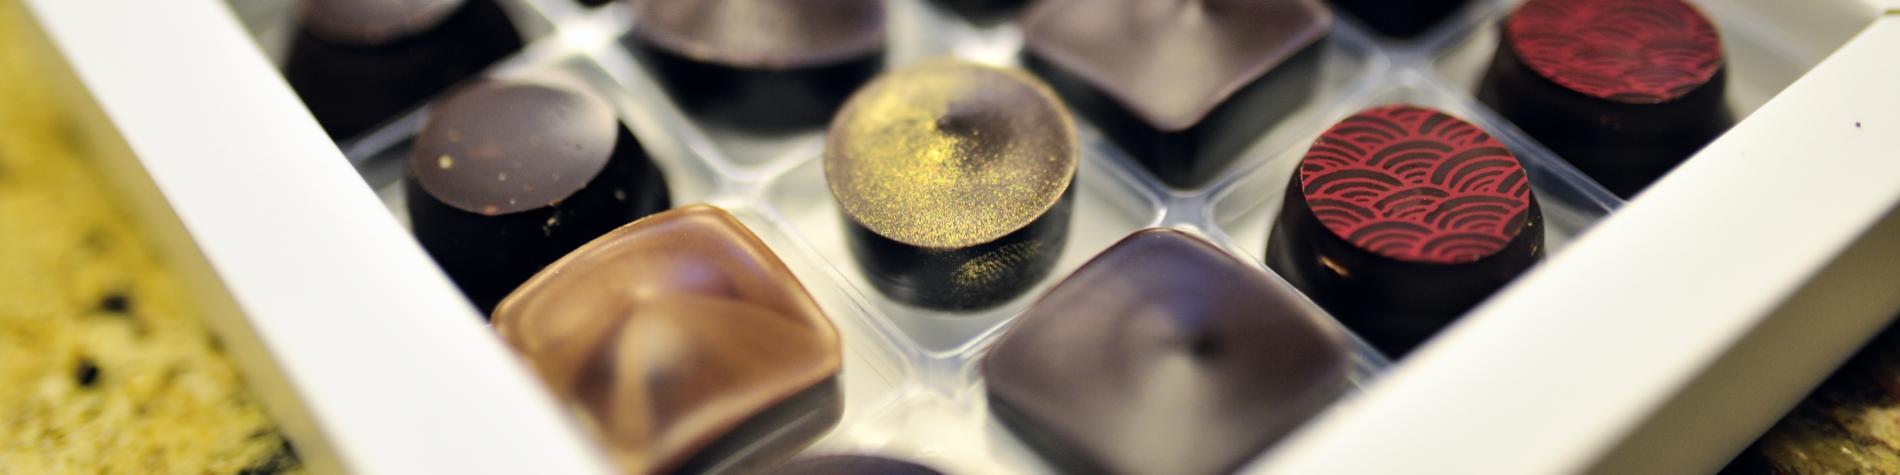 Chocolaterie Druart à Angreau - Pralines